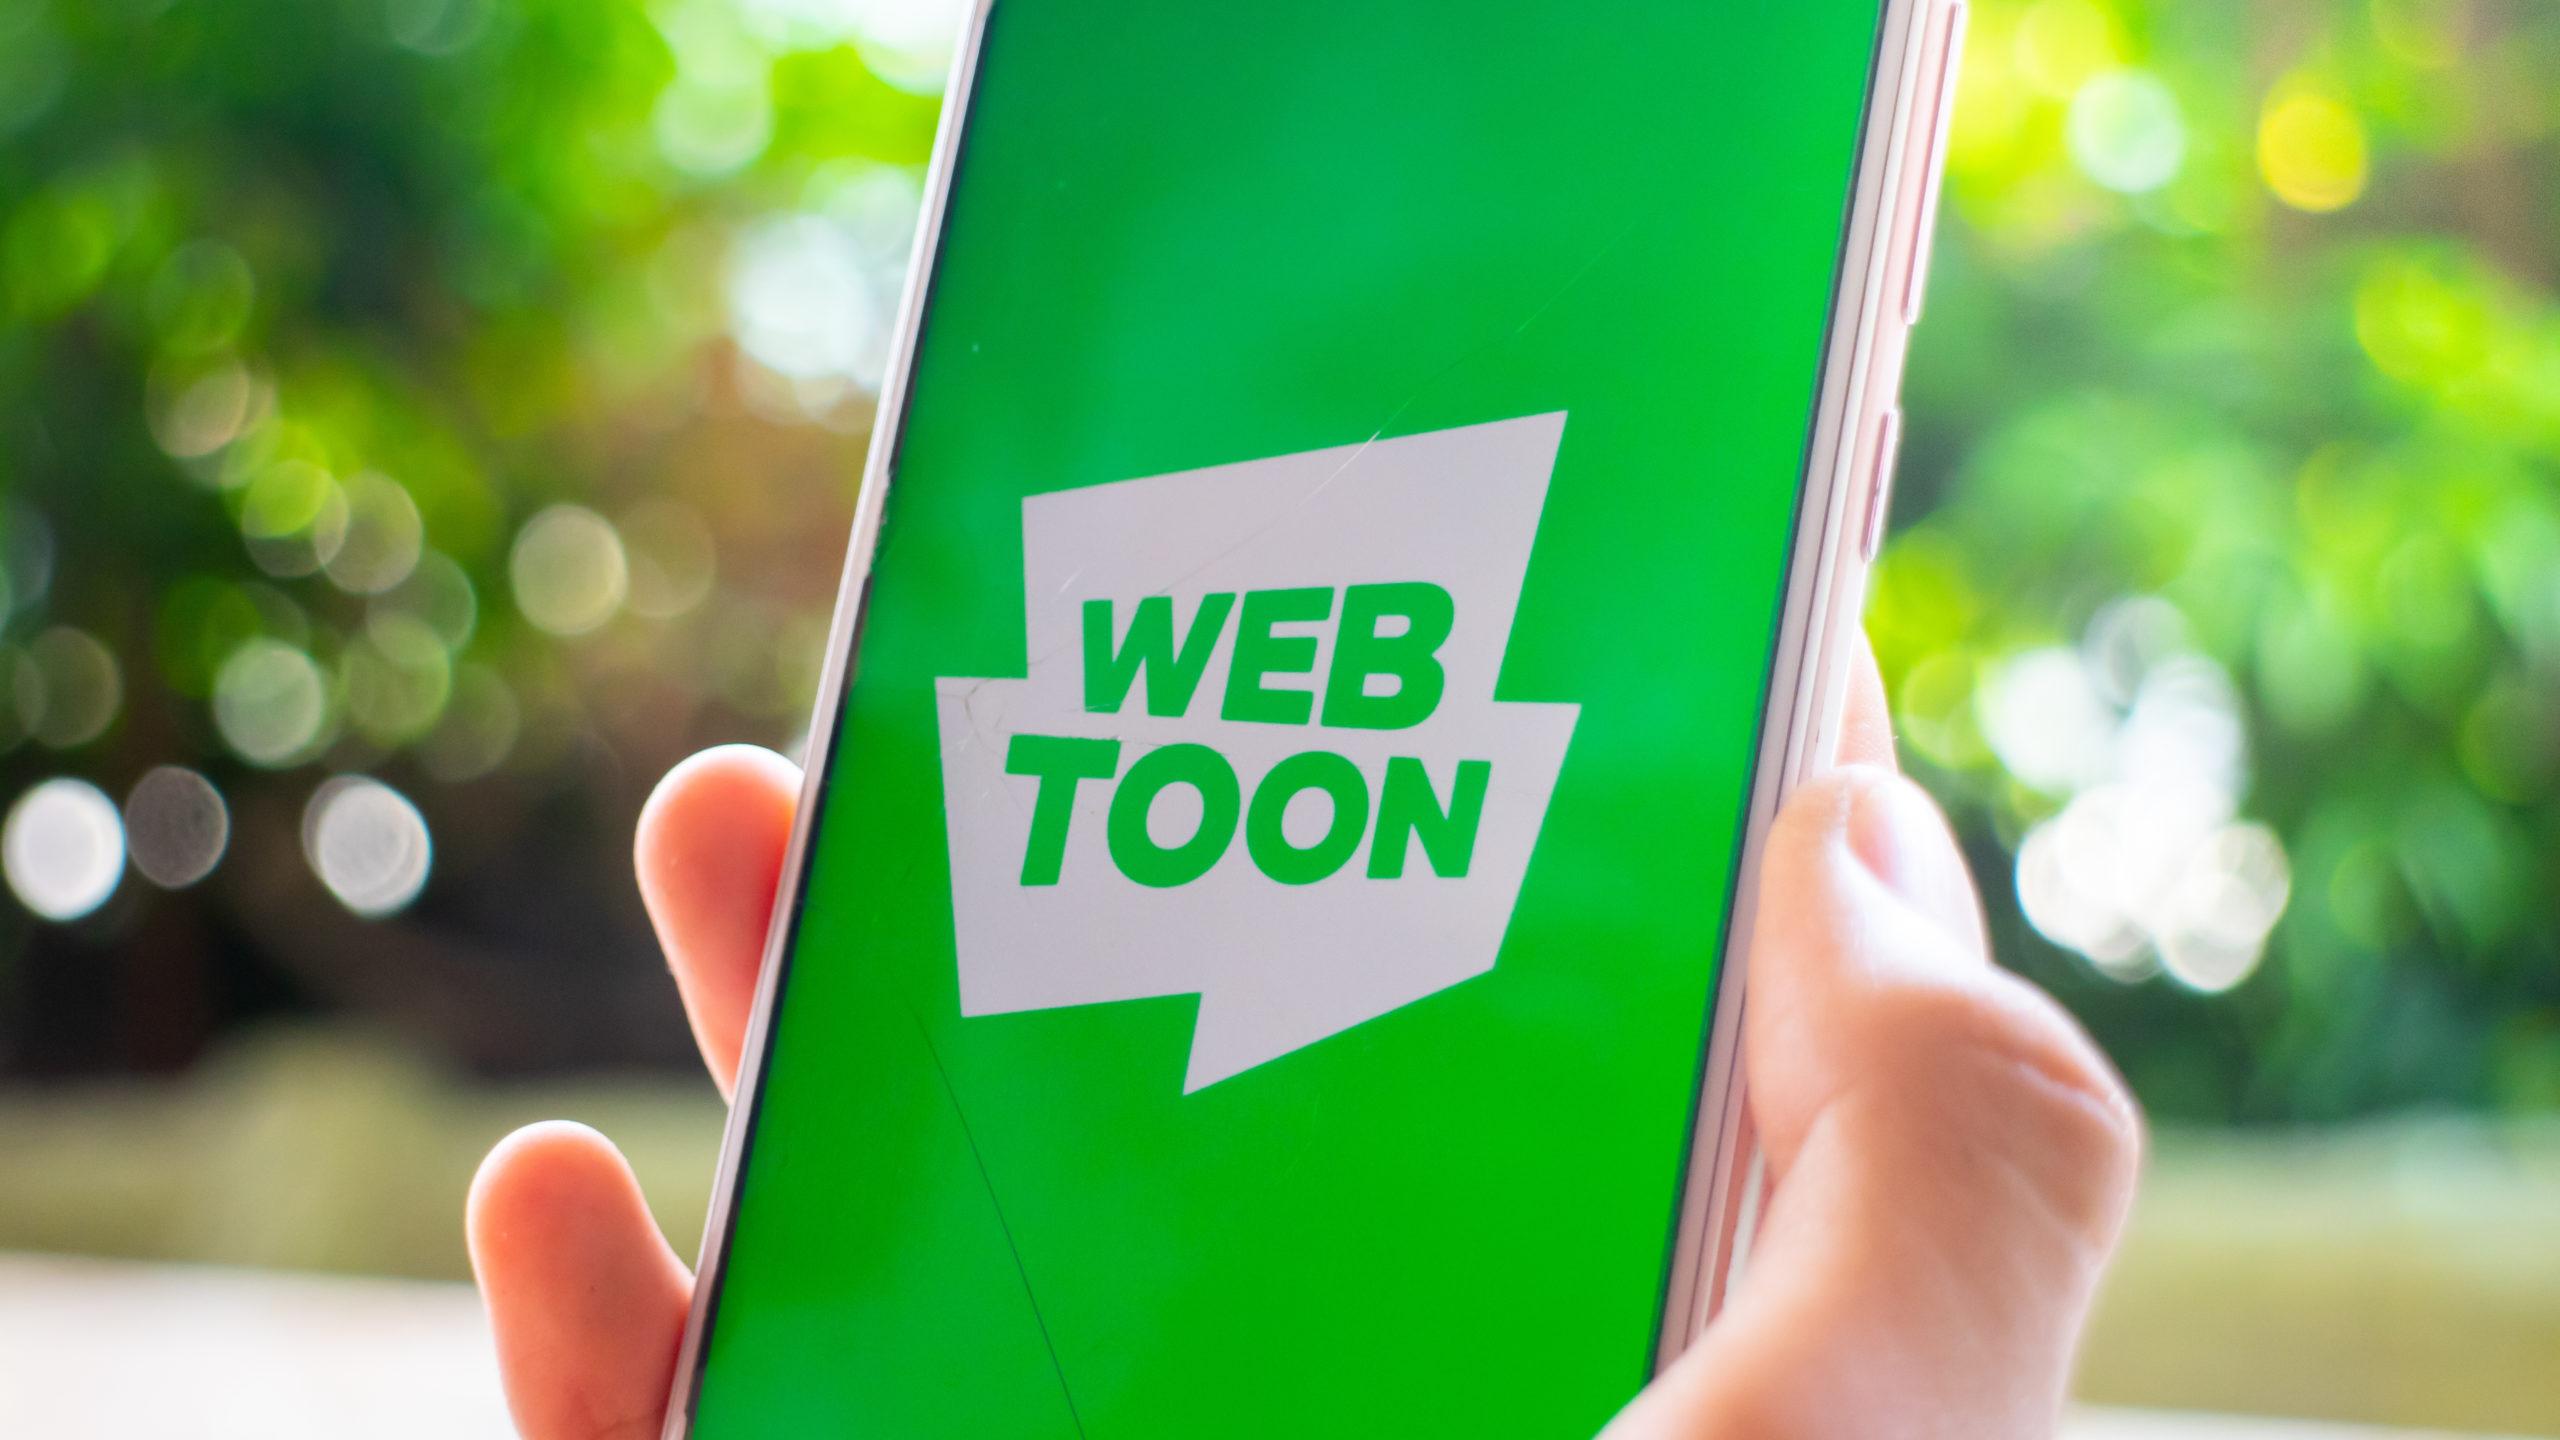 Webtoon, nouveau dessein des stratégies de contenu? | ADC | L'Agence De Contenu